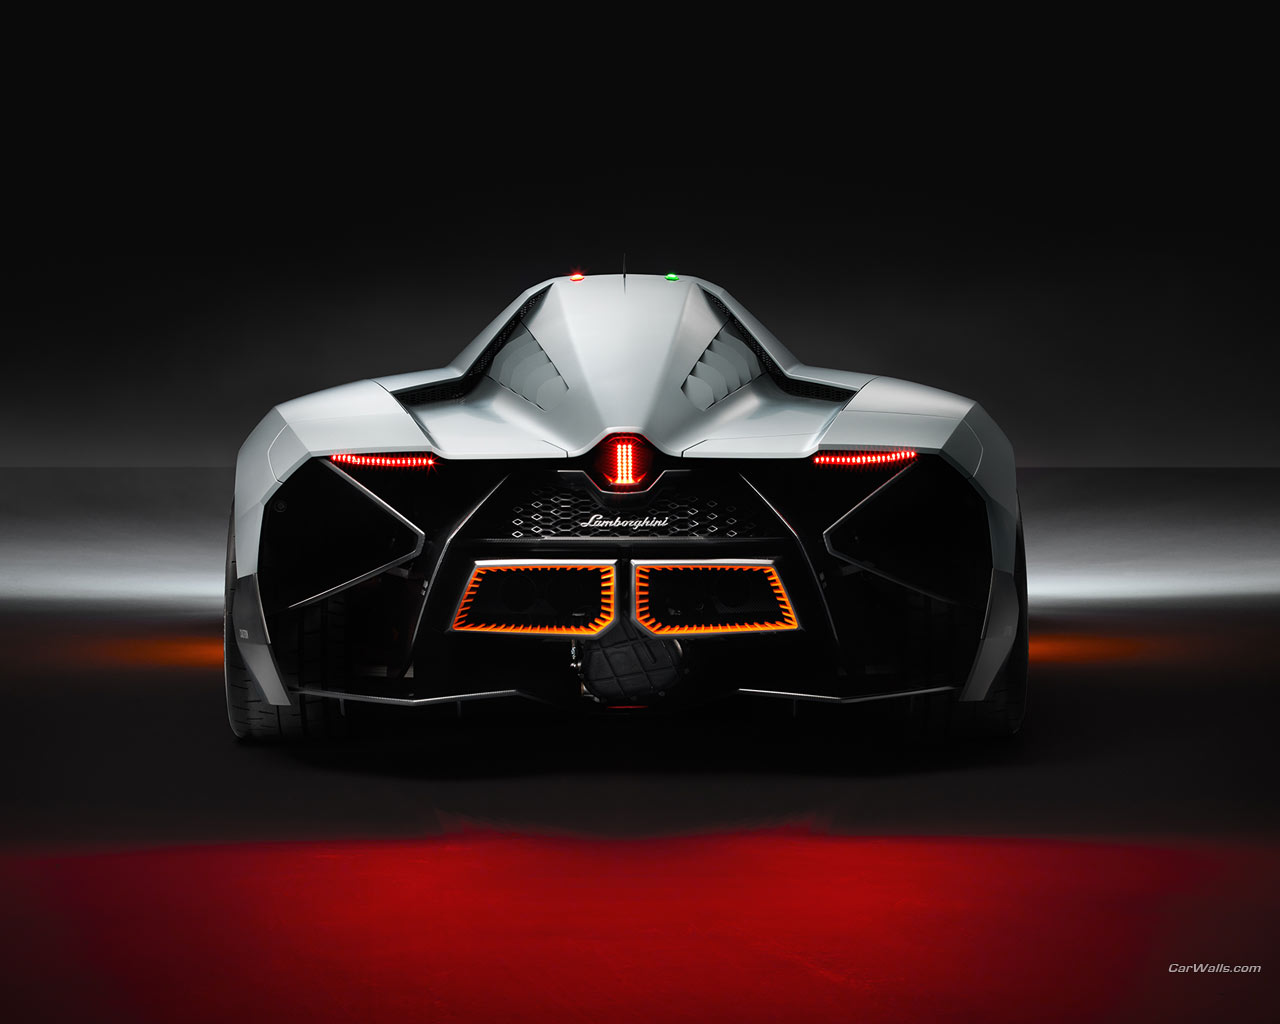 Lamborghini Images Lamborghini Egoista Hd Wallpaper And Background